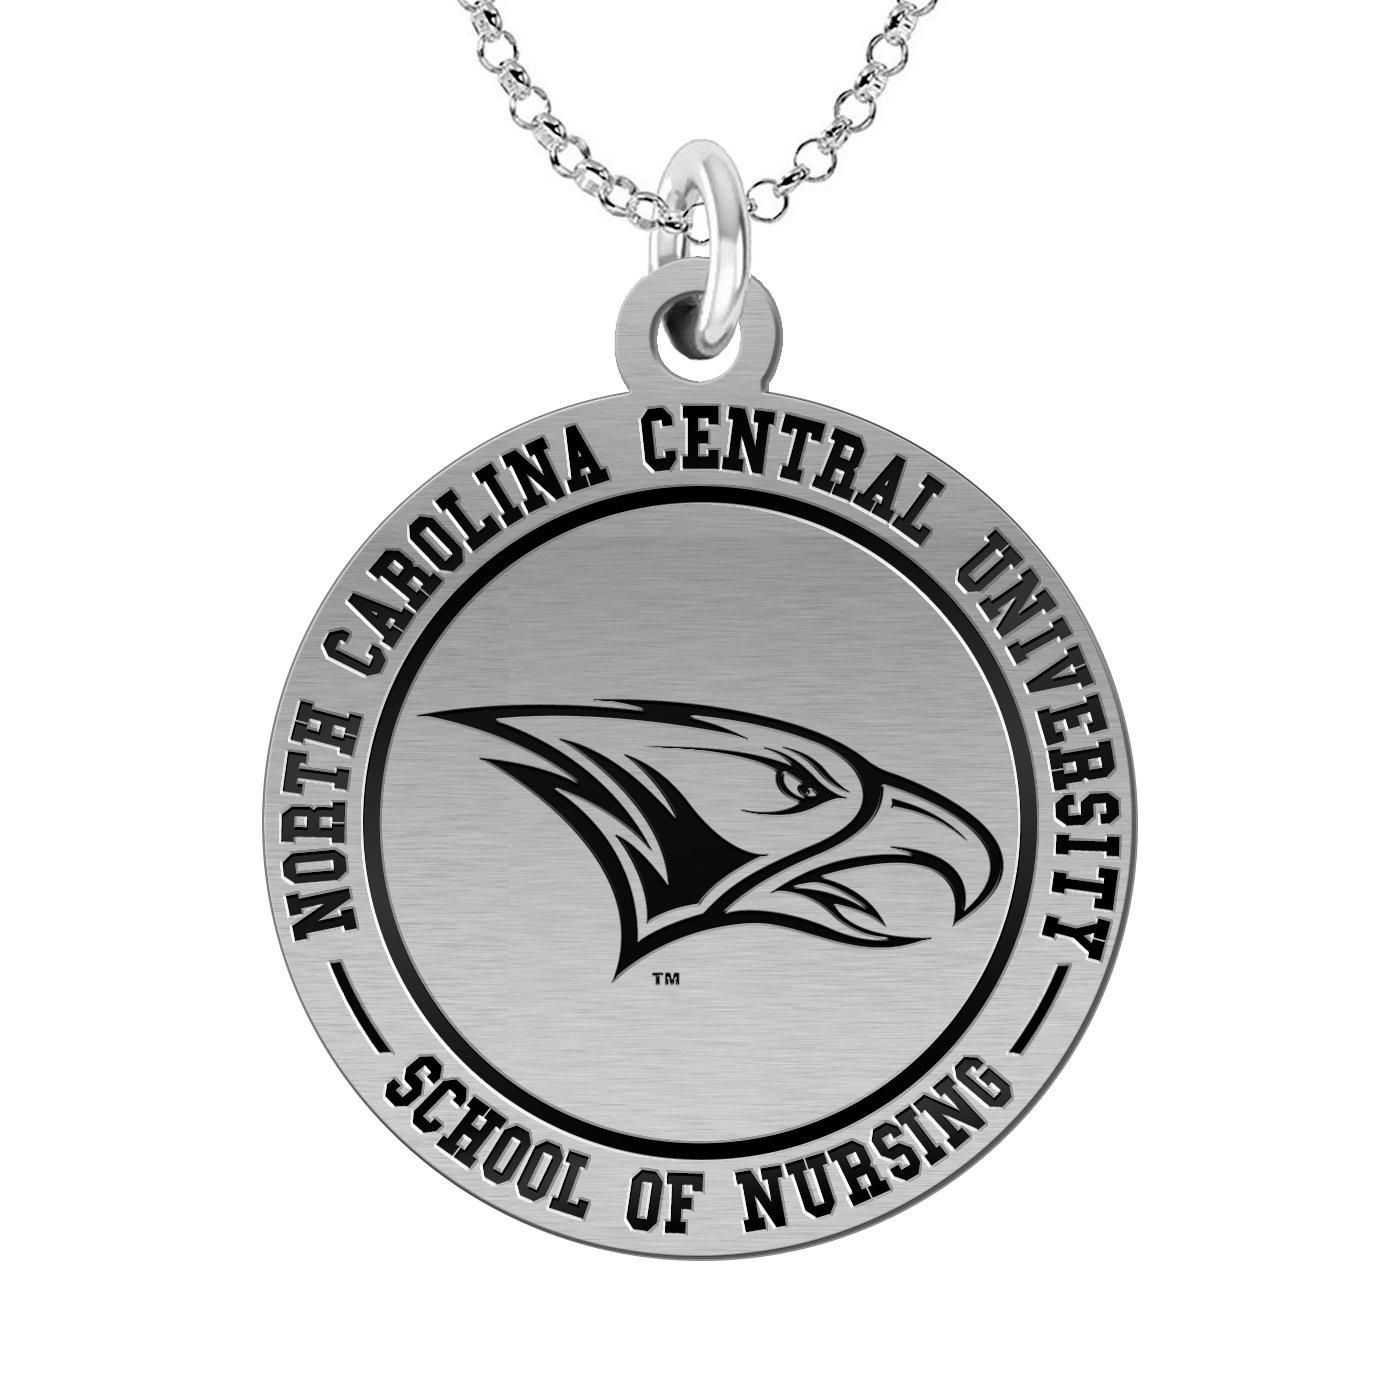 North Carolina Central University School of Nursing Charm